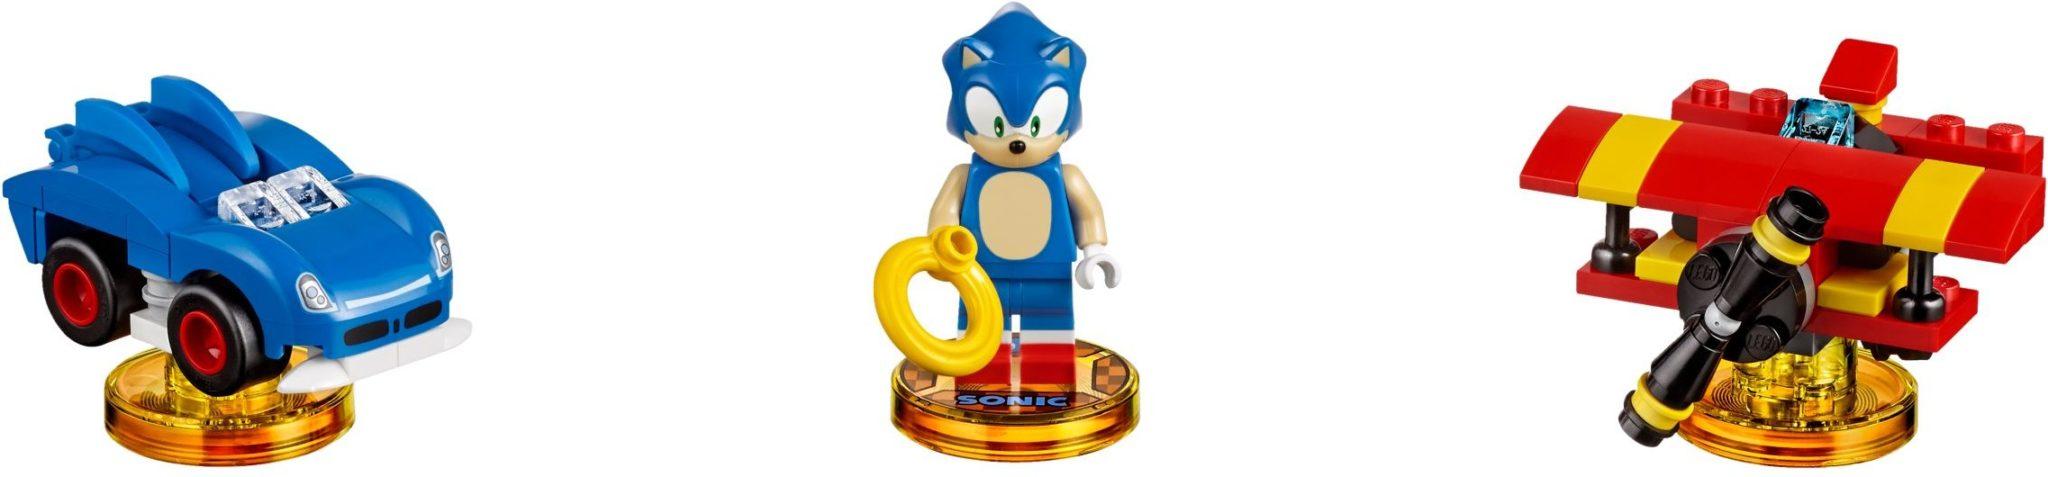 LEGO Dimensions 71244 Sonic The Hedgehog